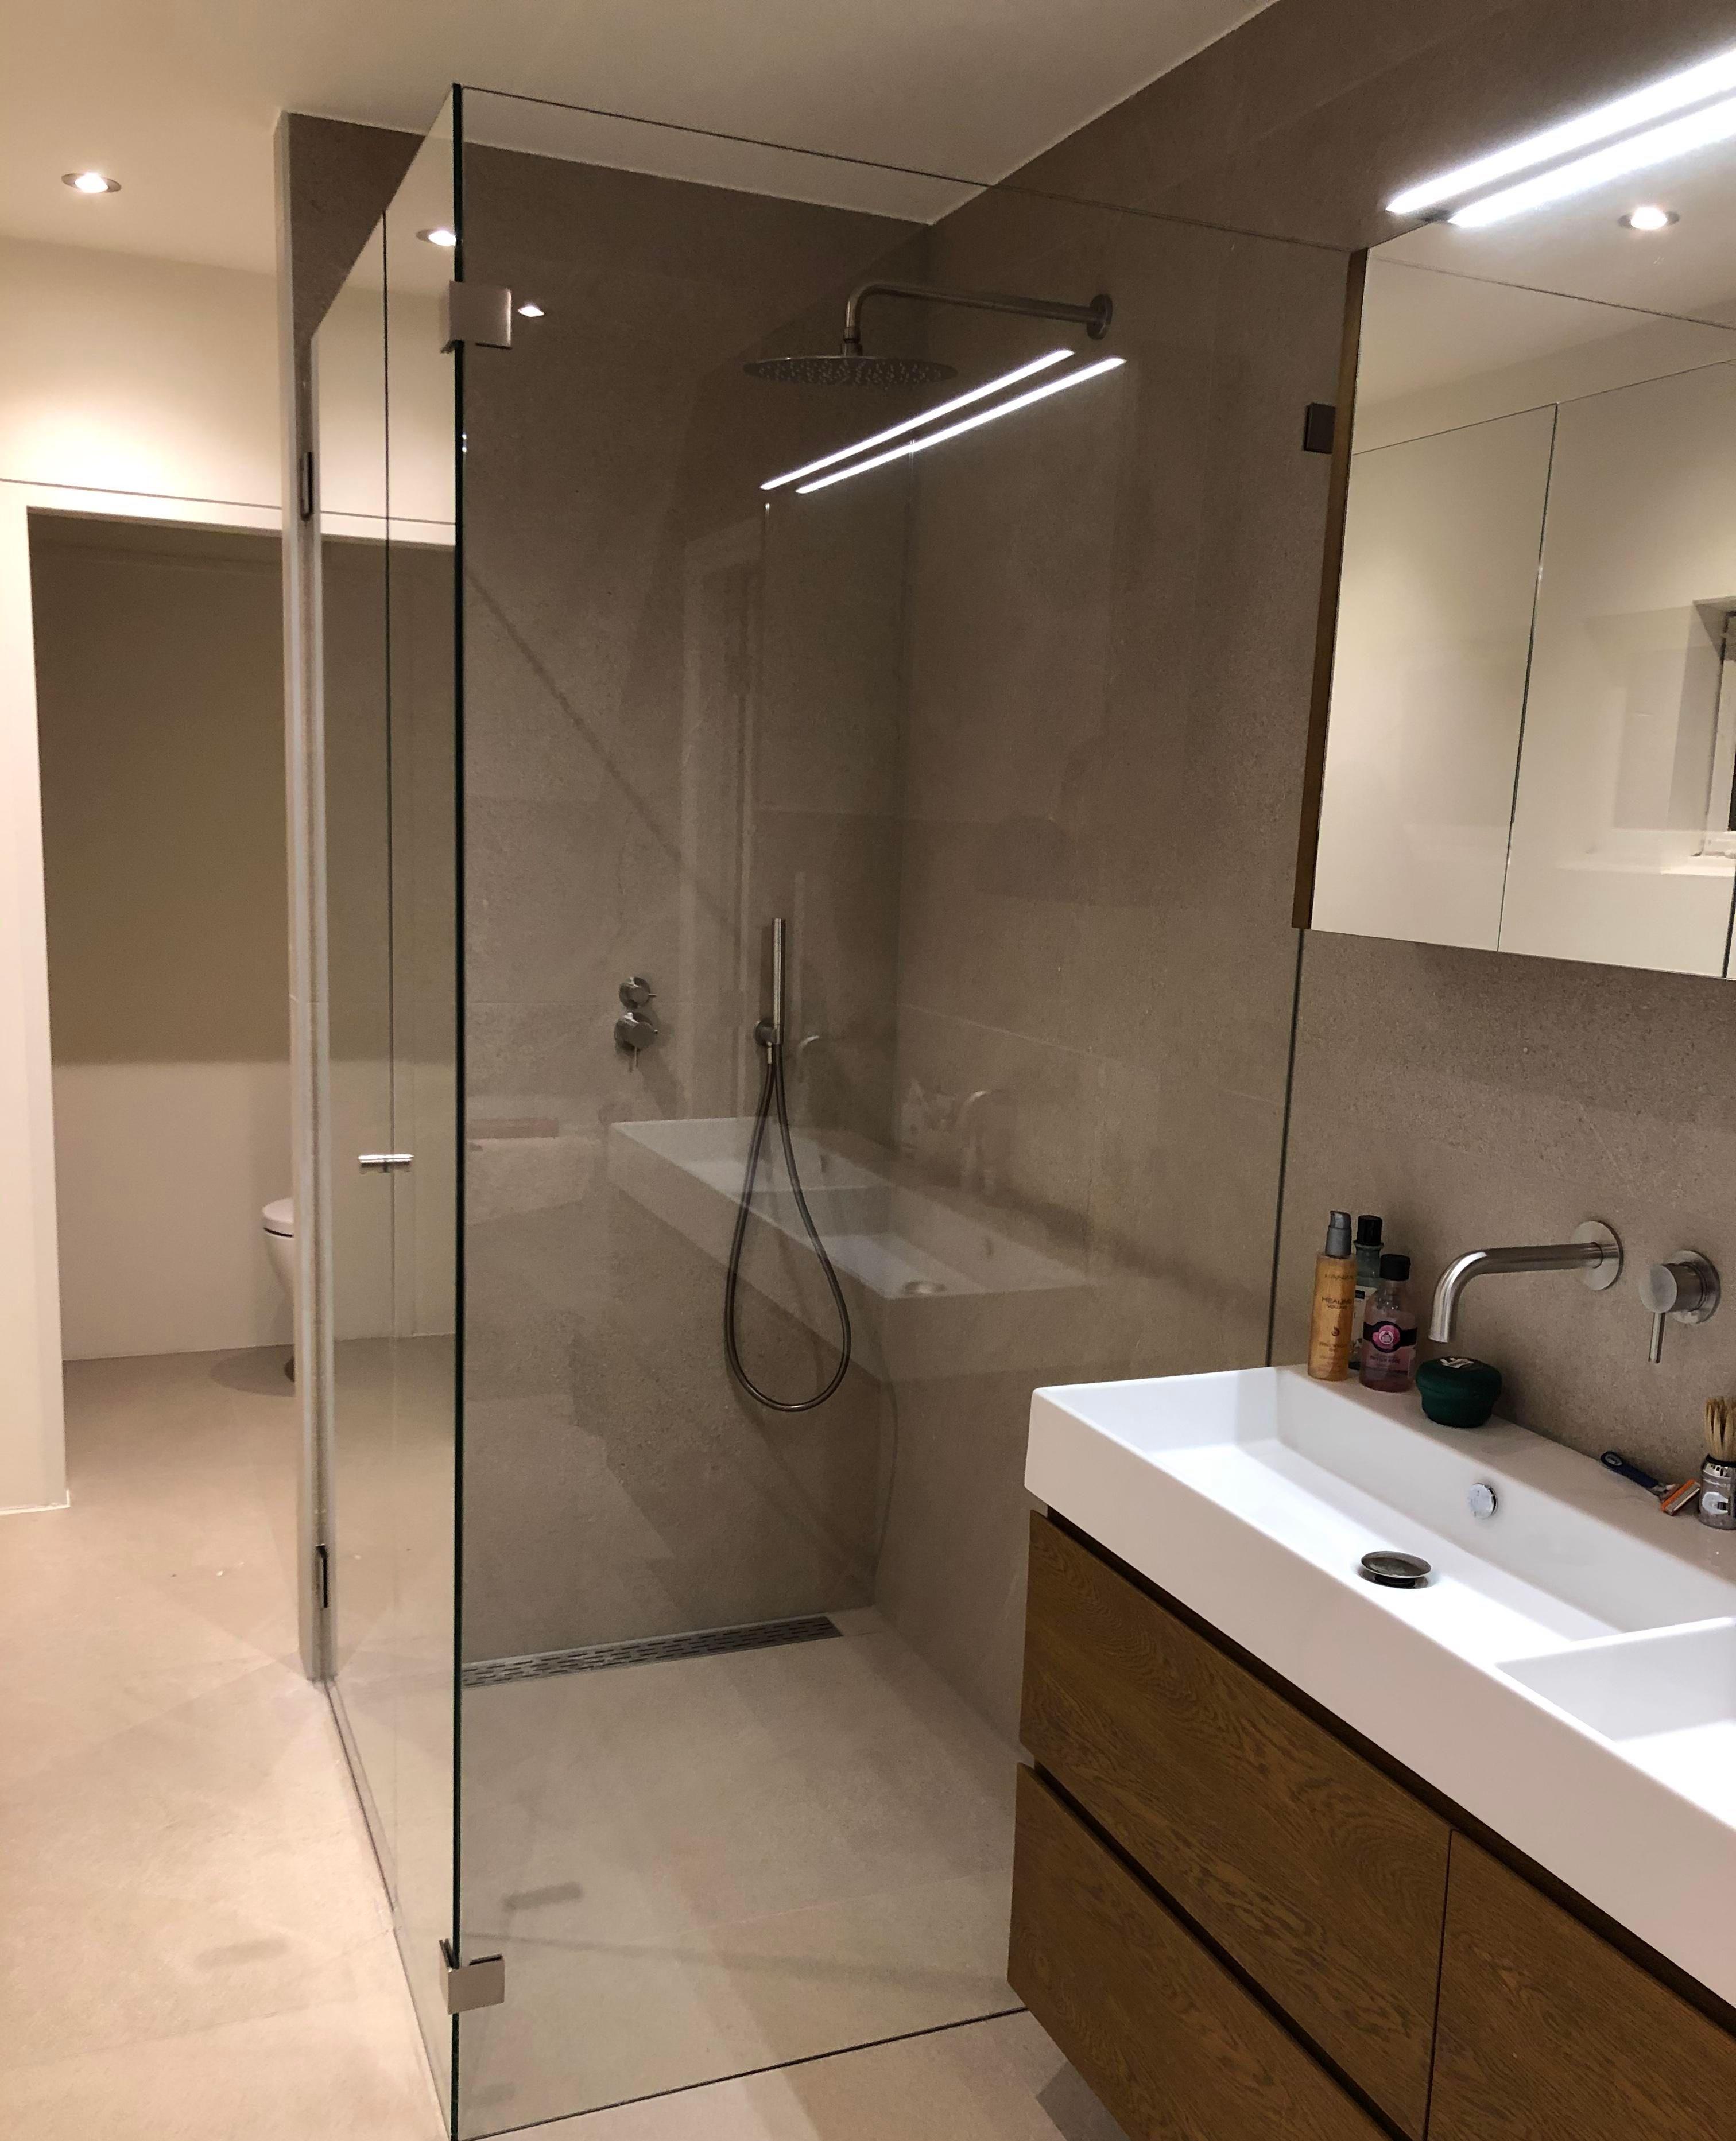 Massgeschneiderte Duschkabine In 2020 Duschkabine Dusche Duschwand